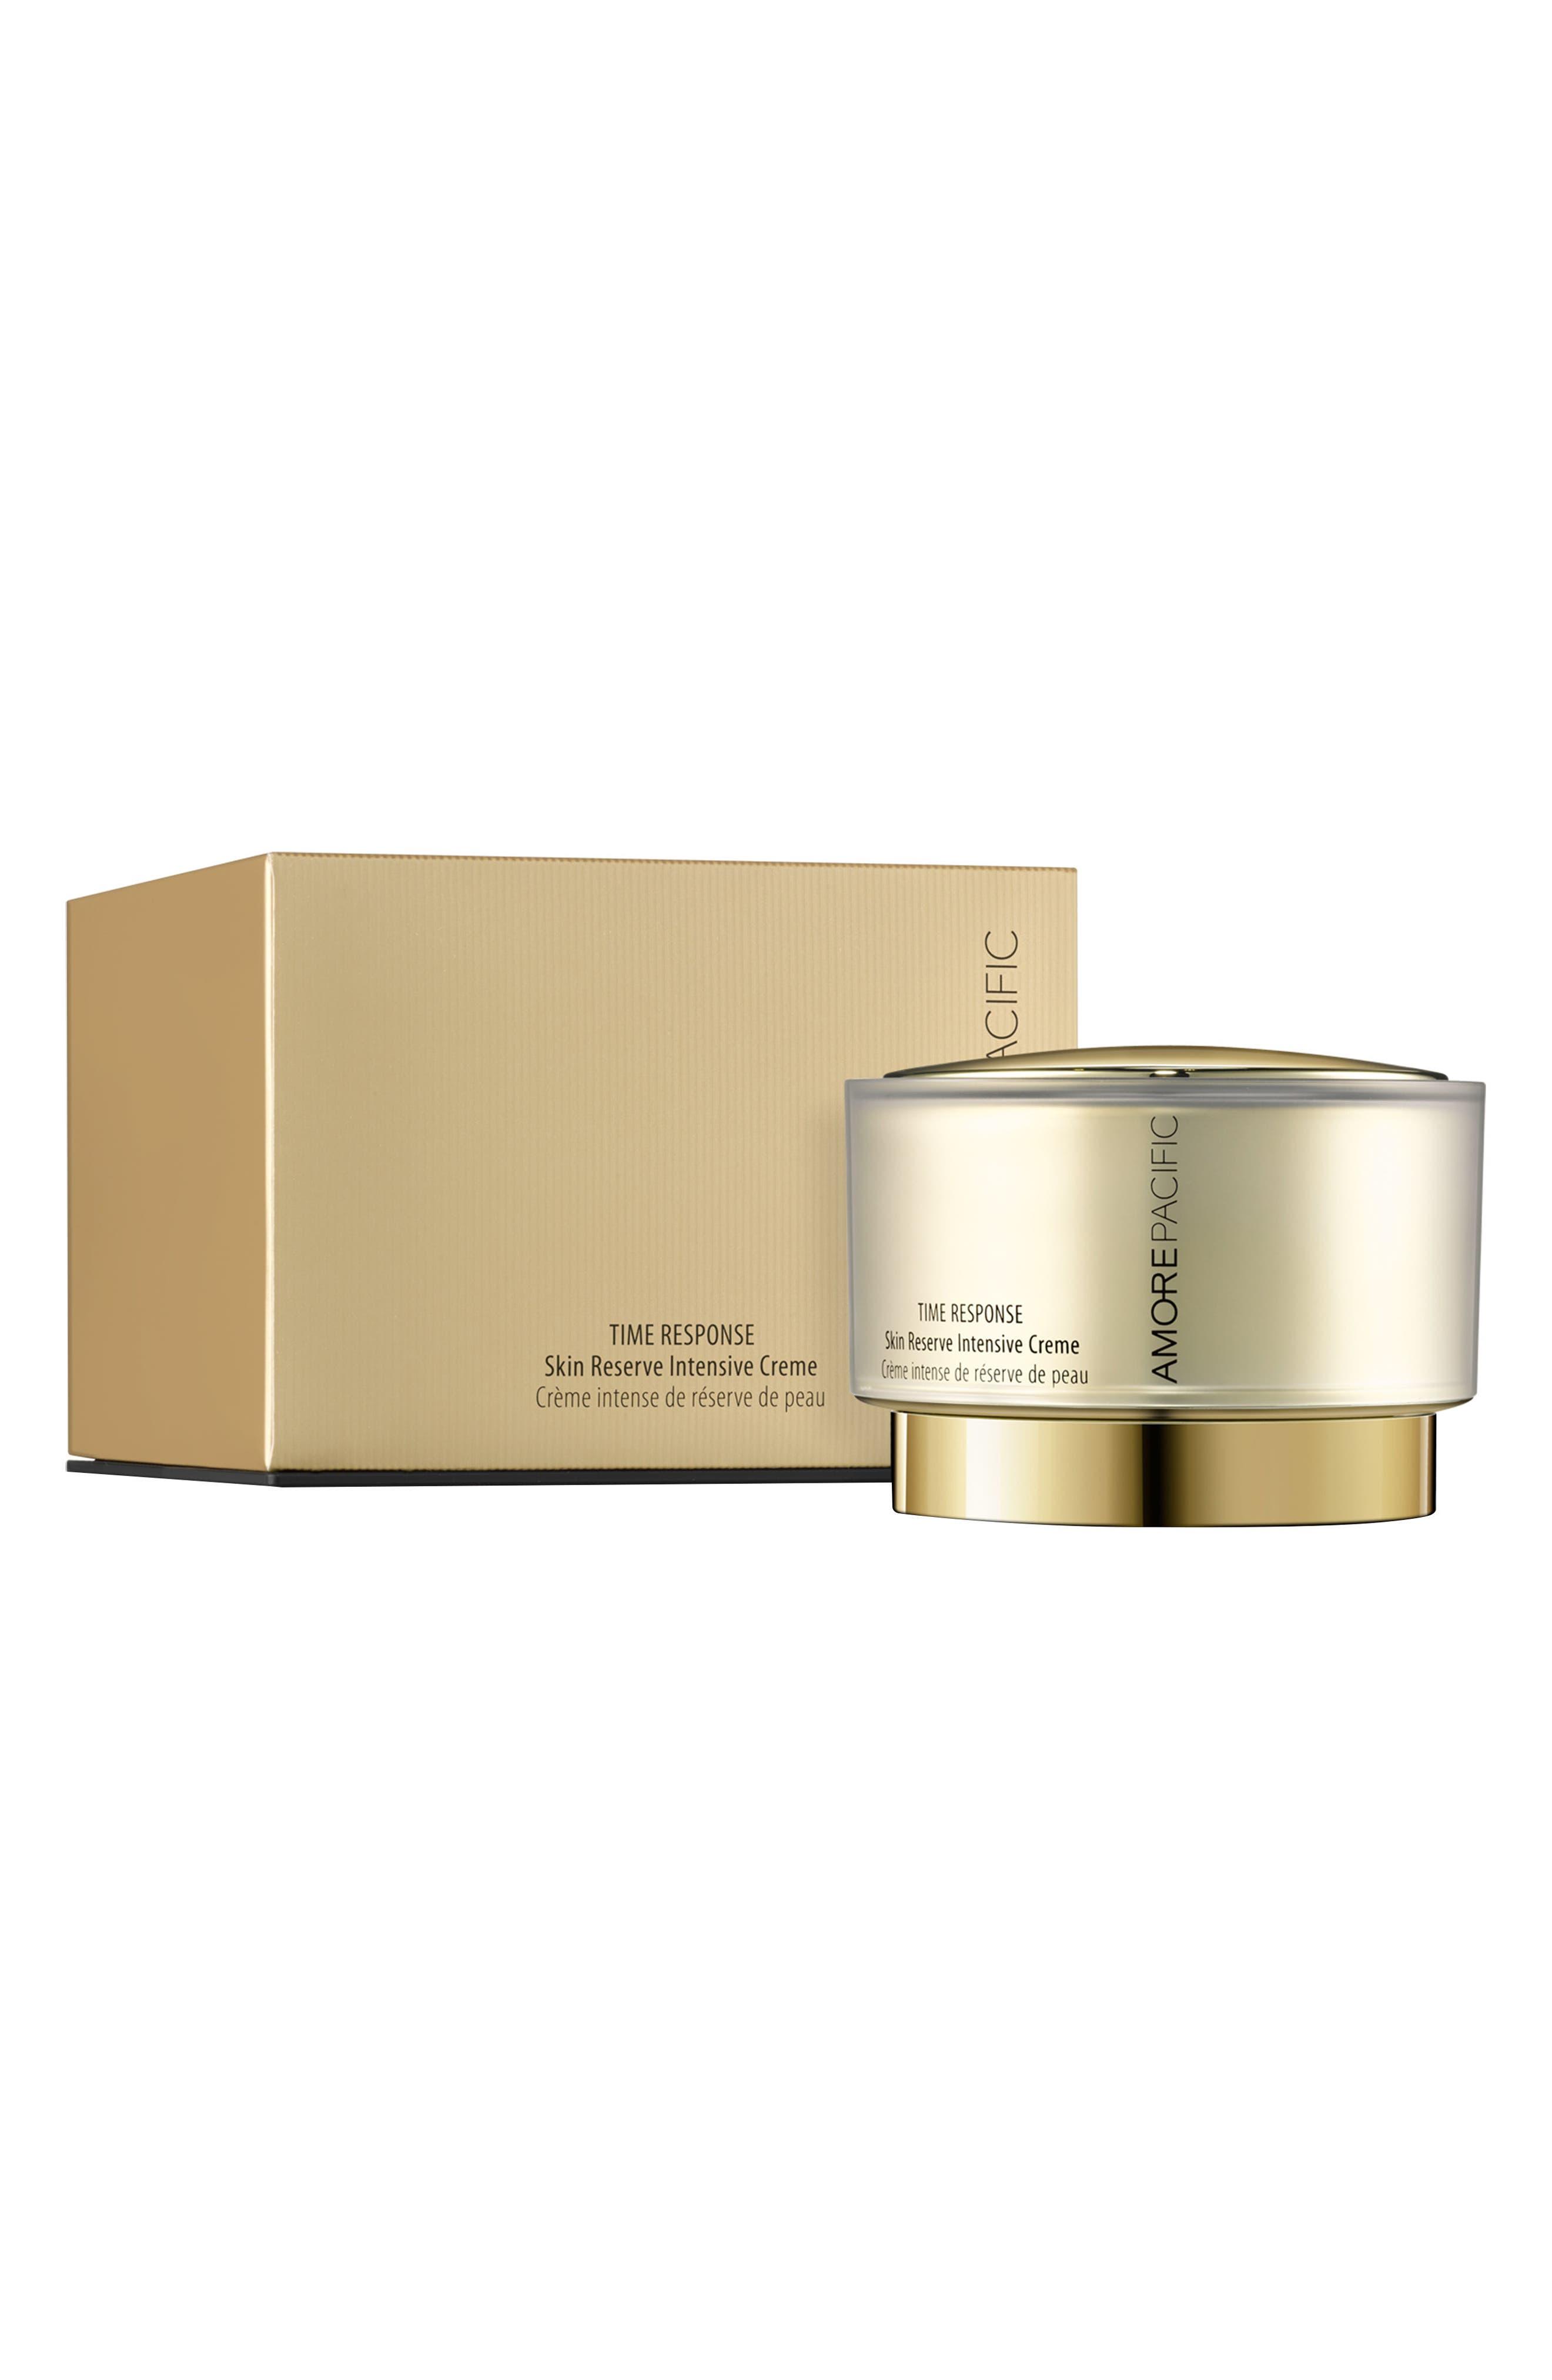 Time Response Skin Reserve Intensive Crème,                             Alternate thumbnail 2, color,                             No Color